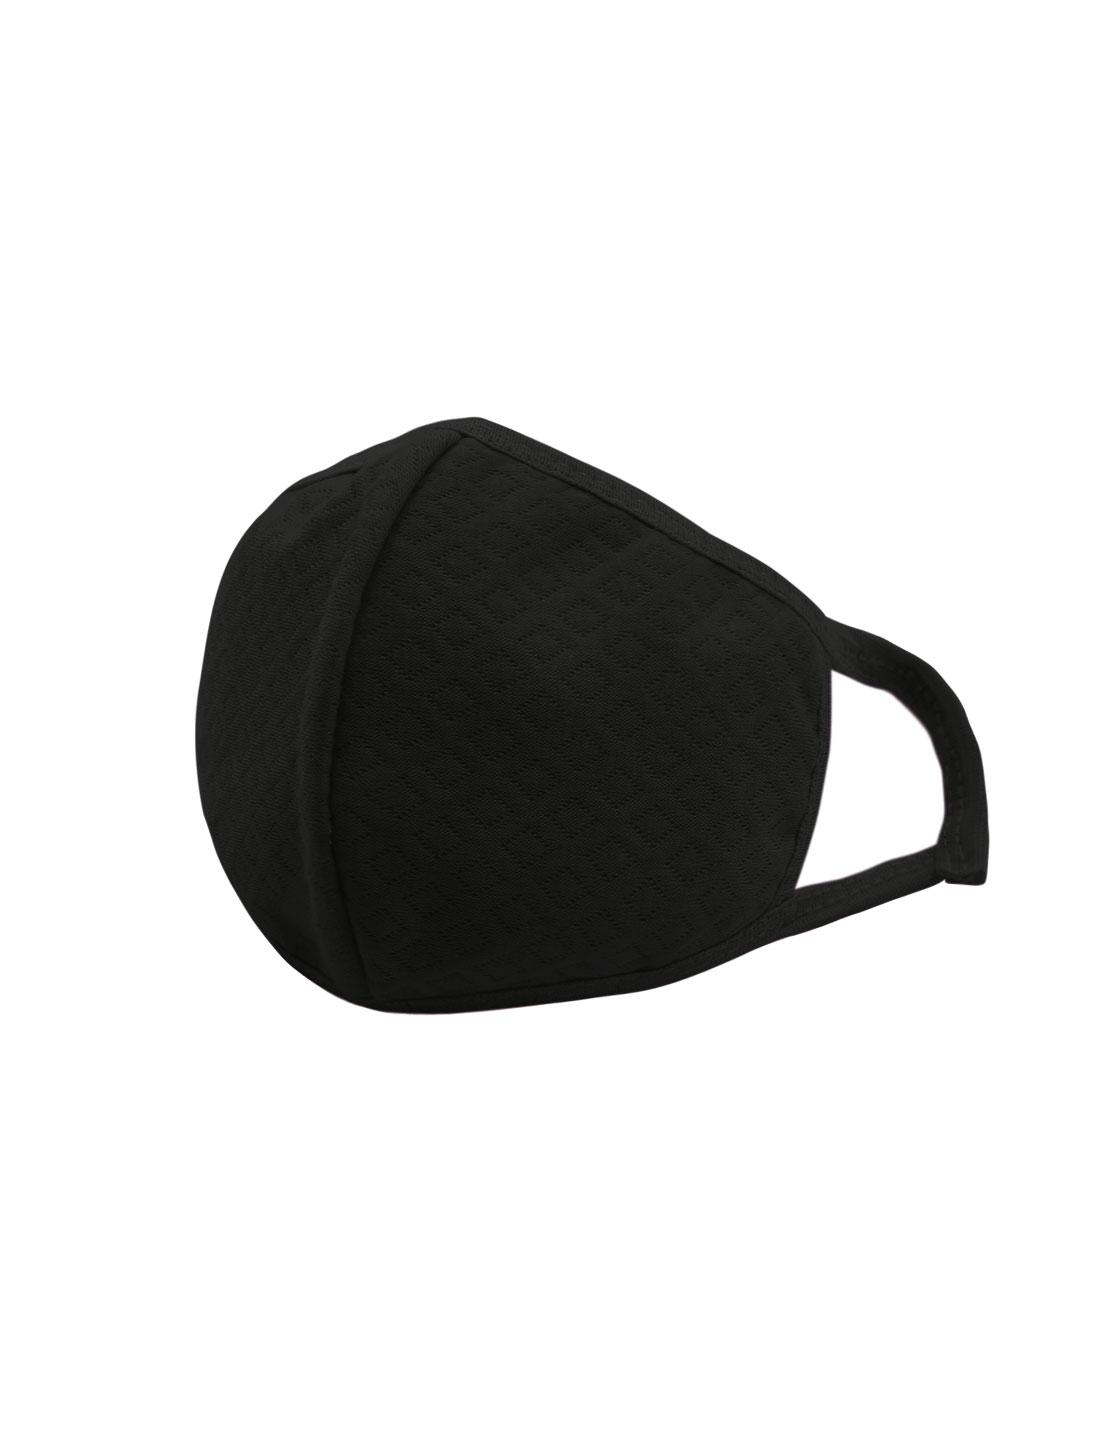 Unisex Elastic Earloops Argyle Design Anti-dust Mouth Mask Black